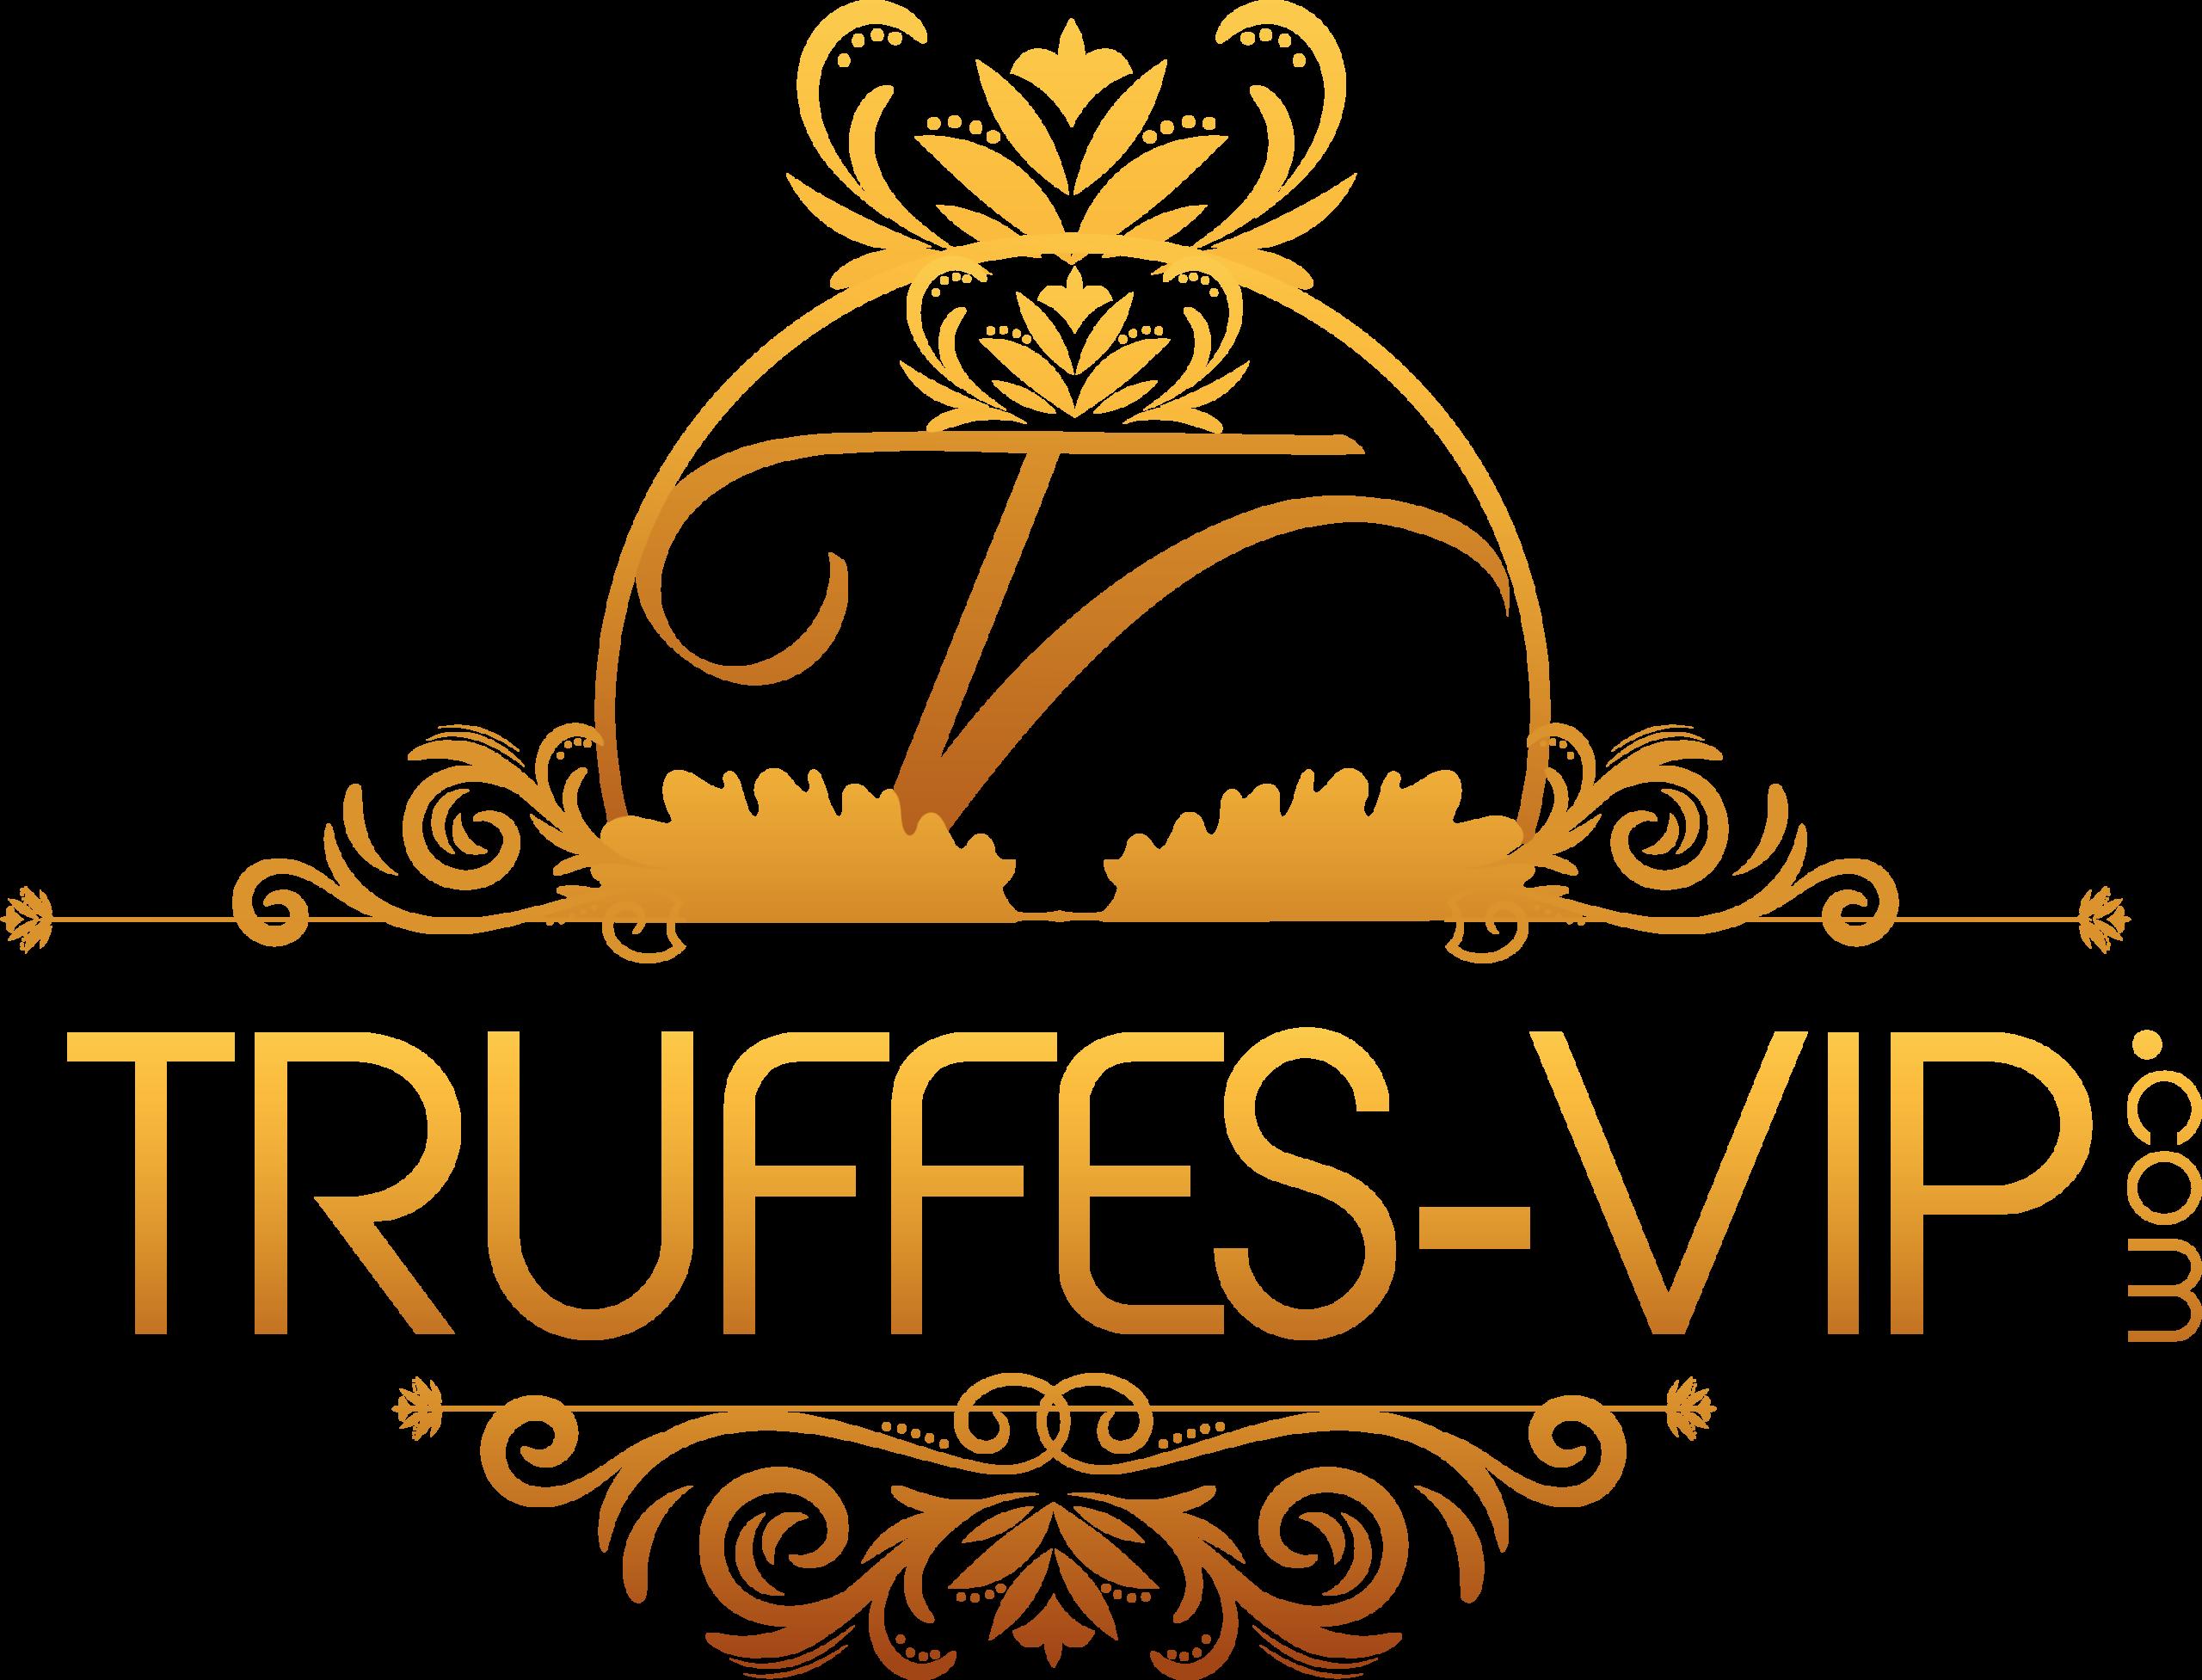 VIP truffles